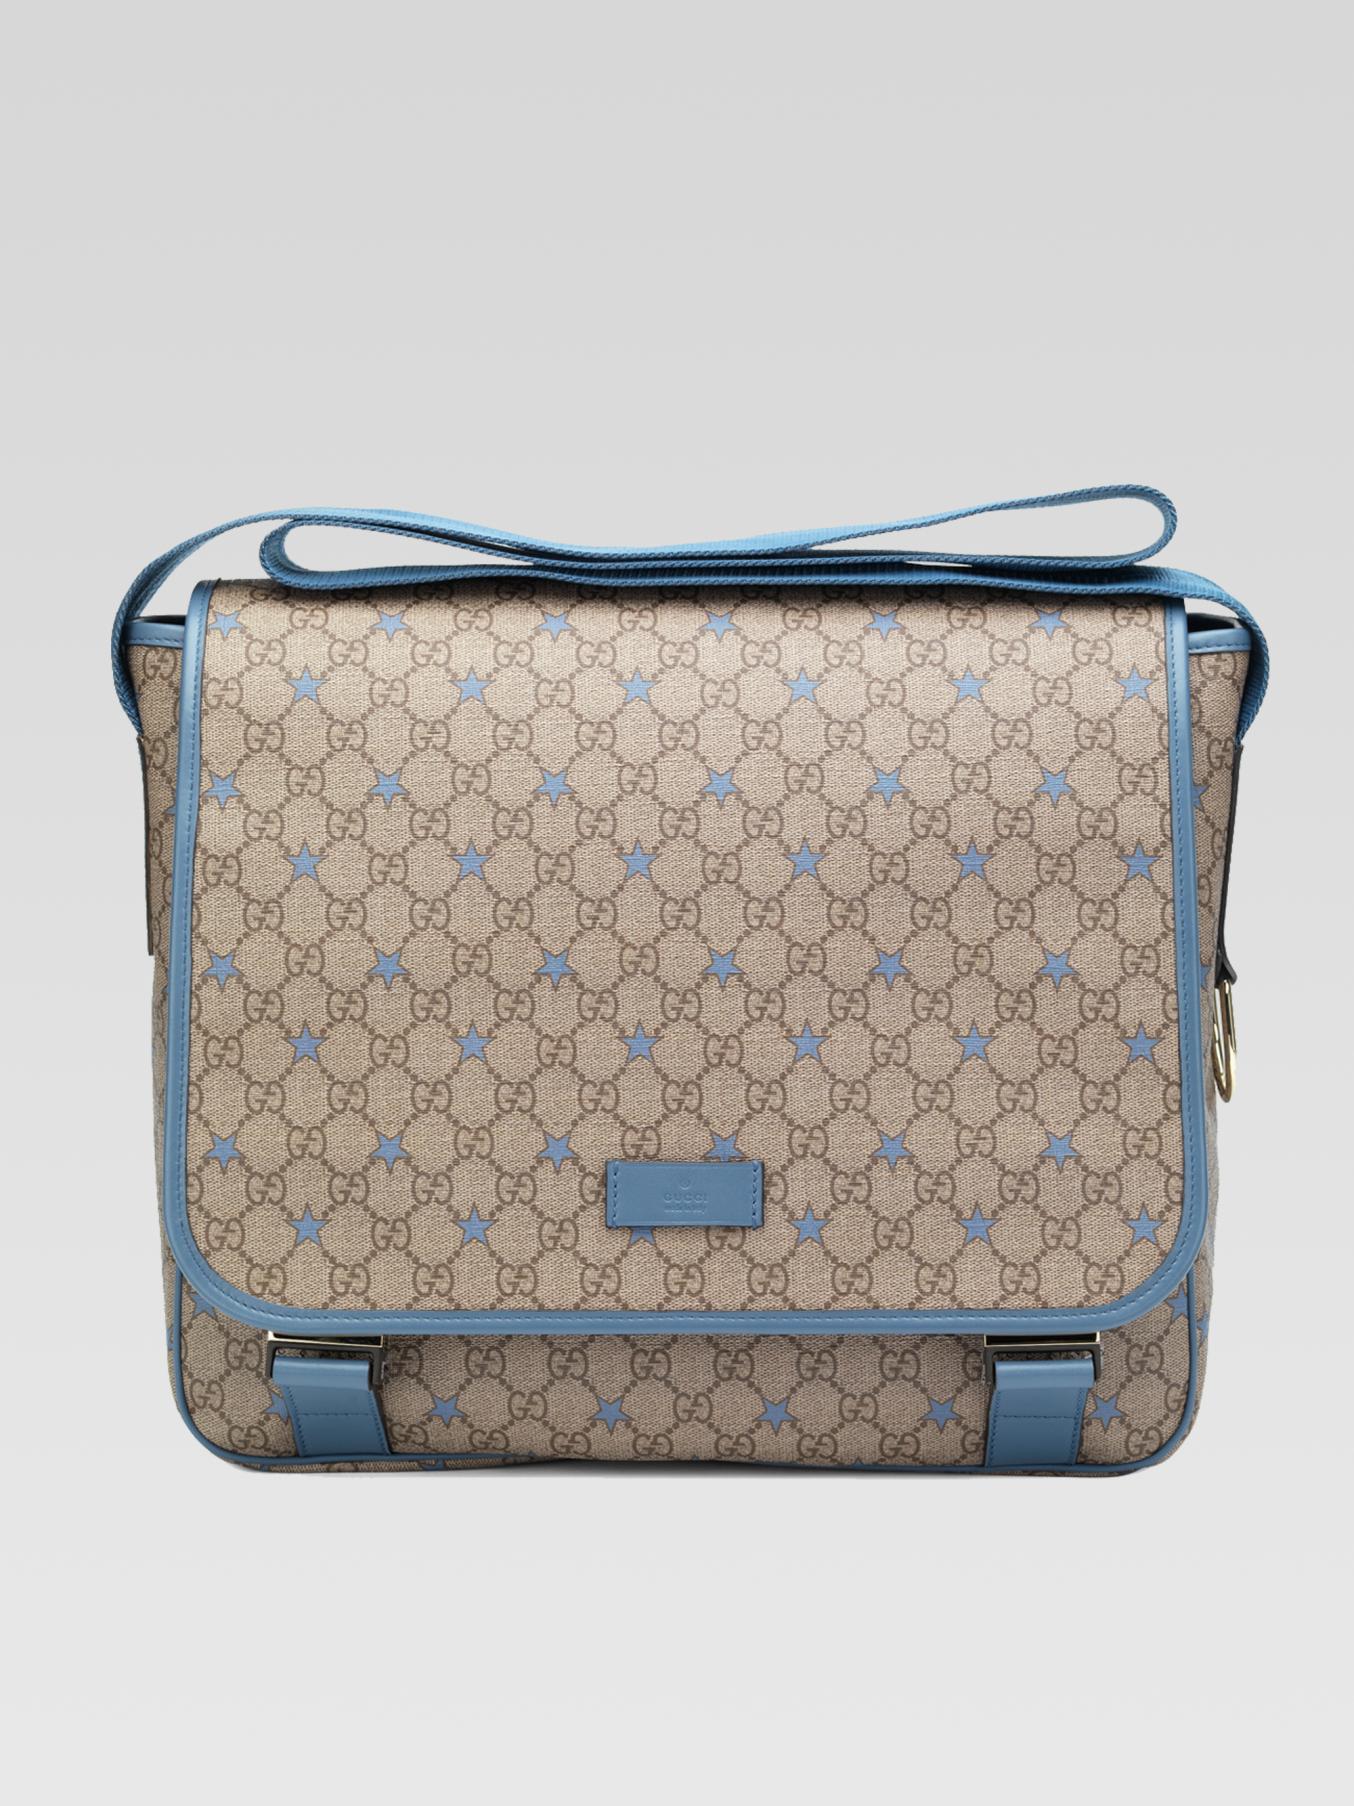 69ecd96ddba39b Gucci Micro Gg Supreme Canvas Stars Diaper Bag in Blue - Lyst